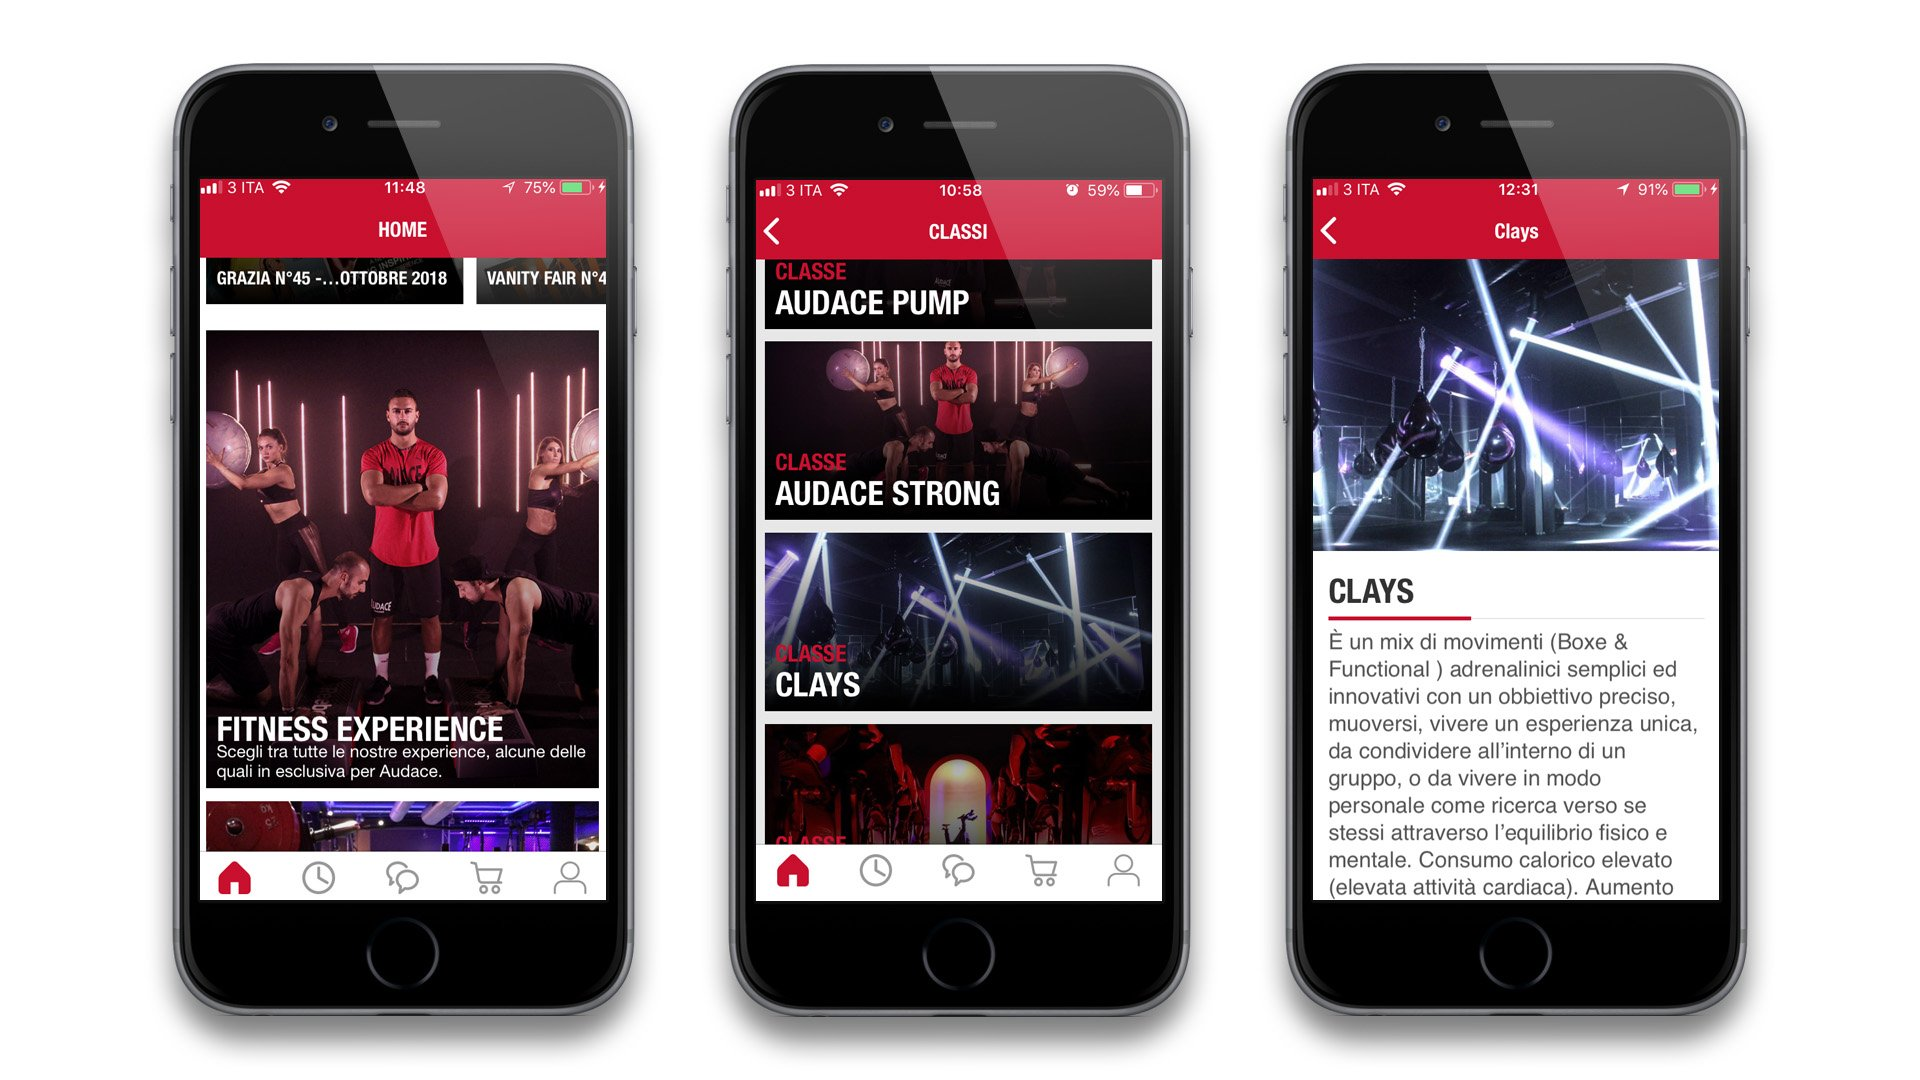 Audace App Fitness Esperience